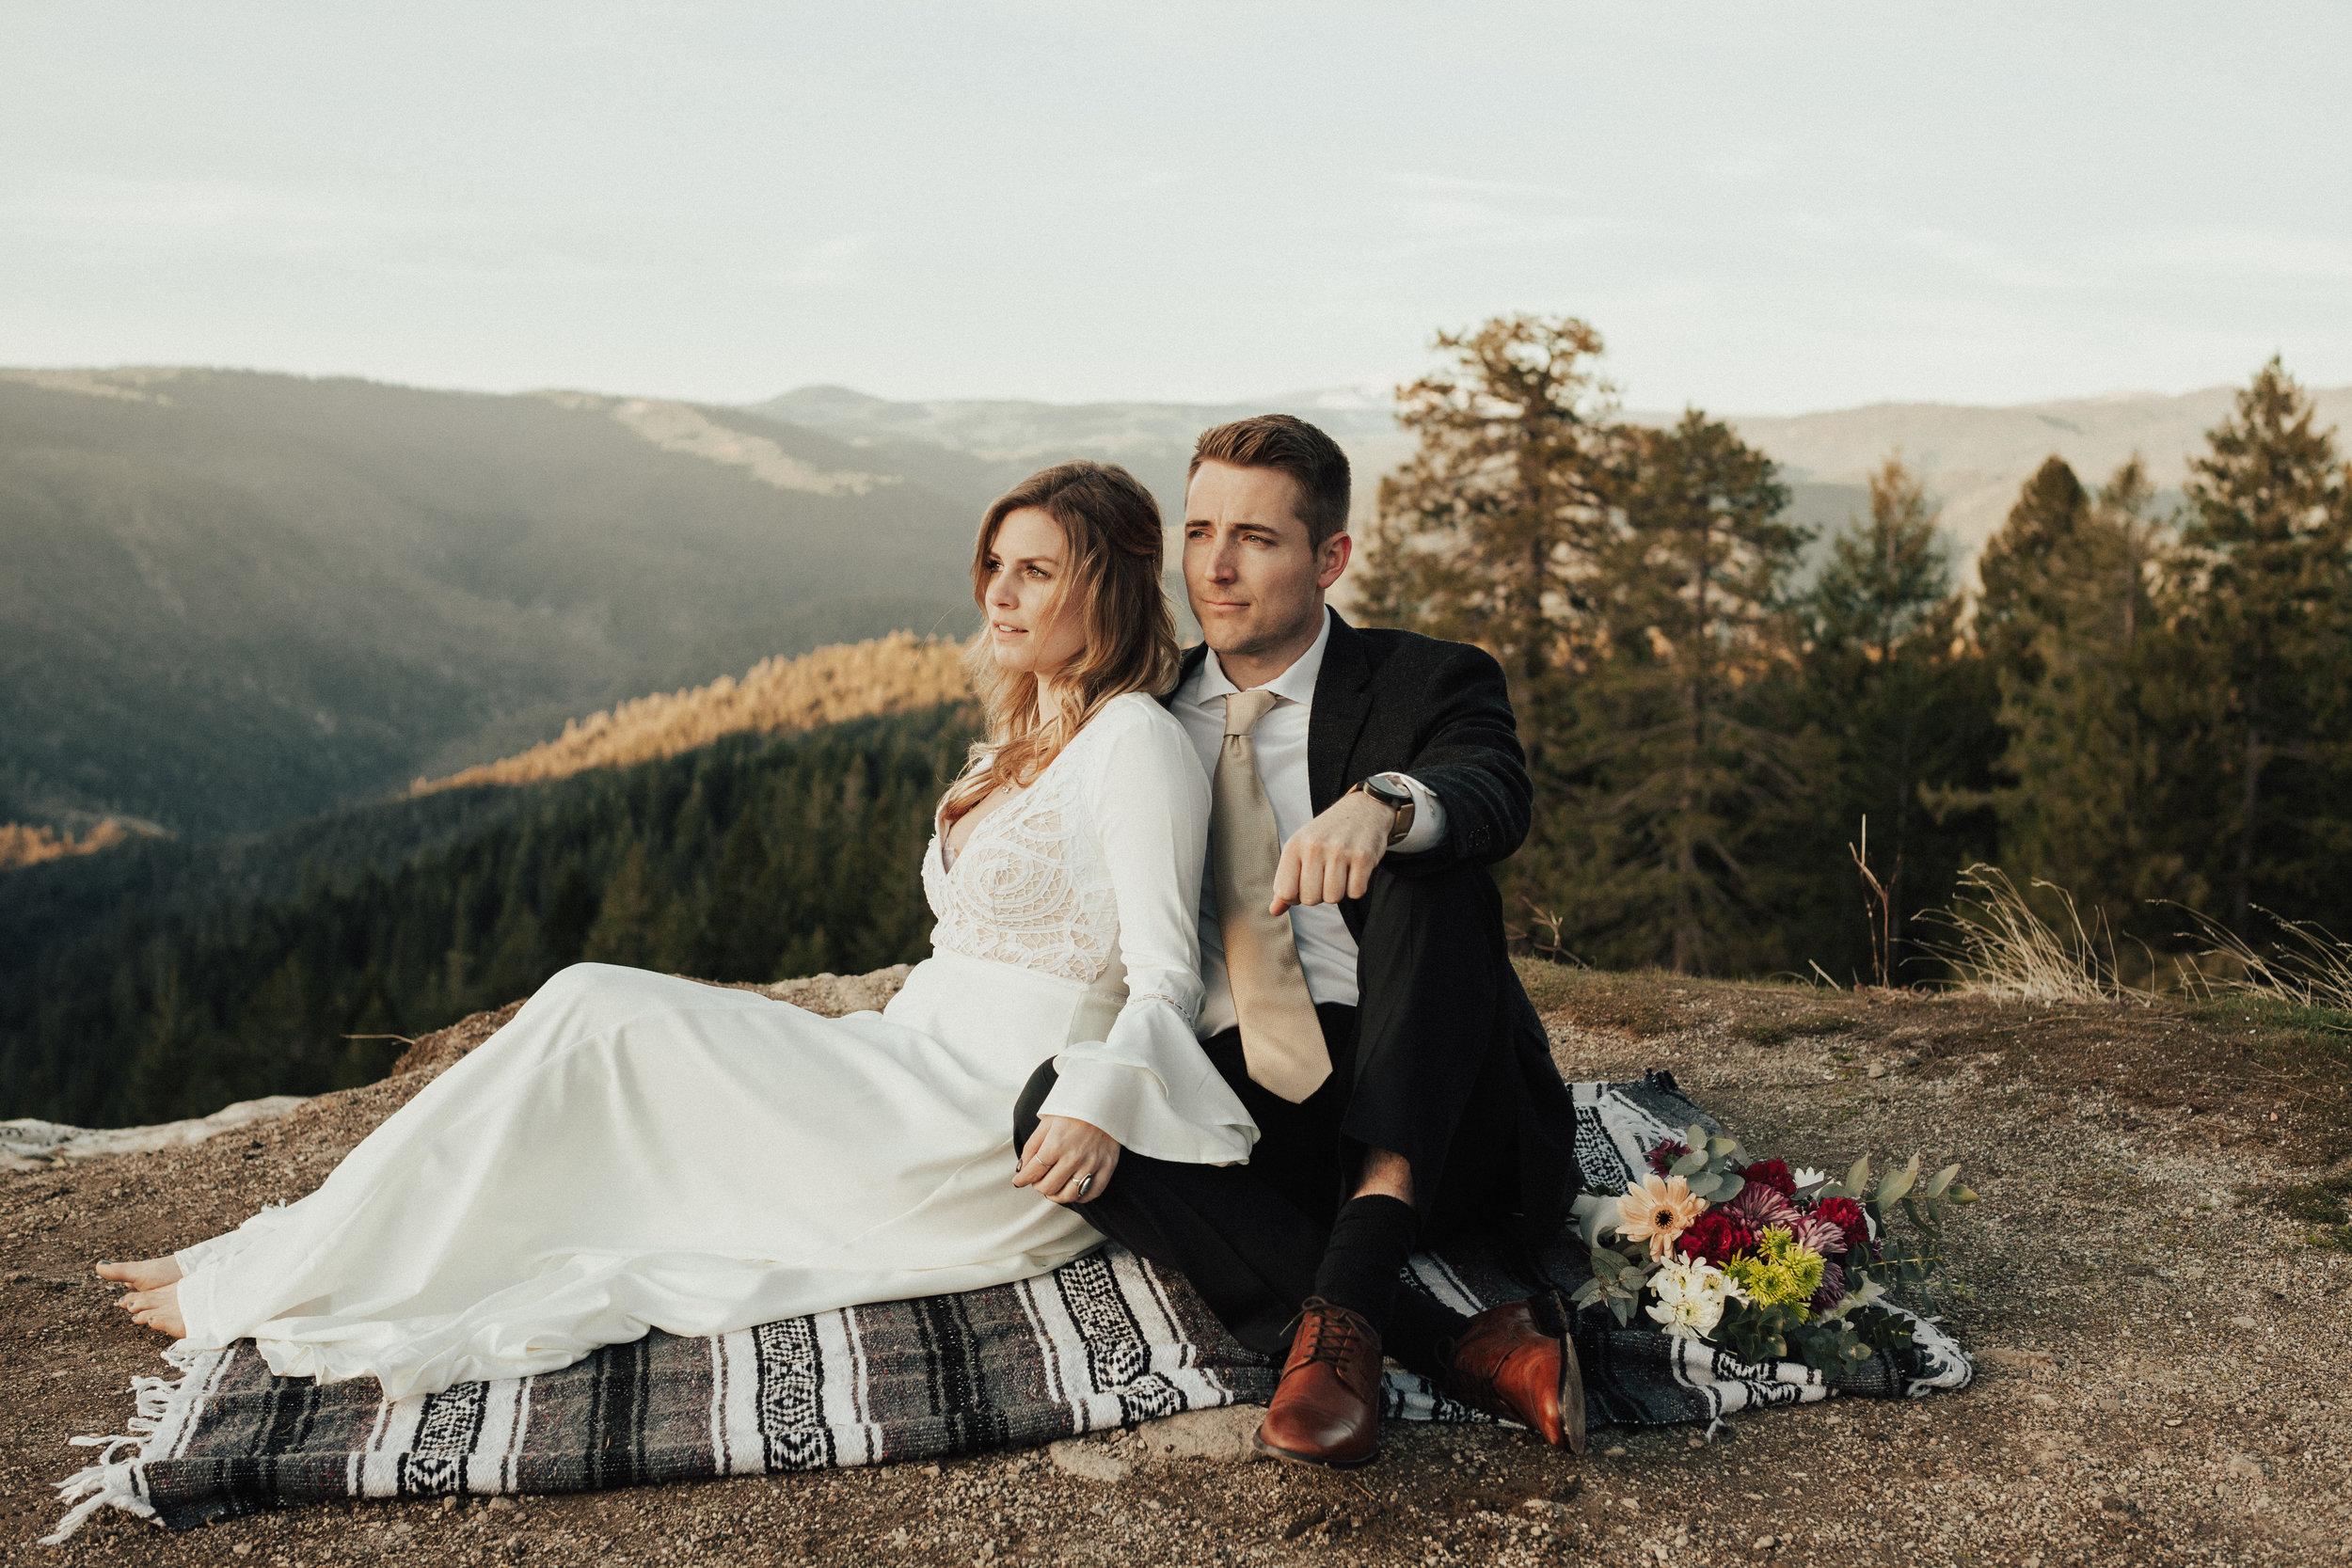 Intimate Wedding Photography near Sacramento